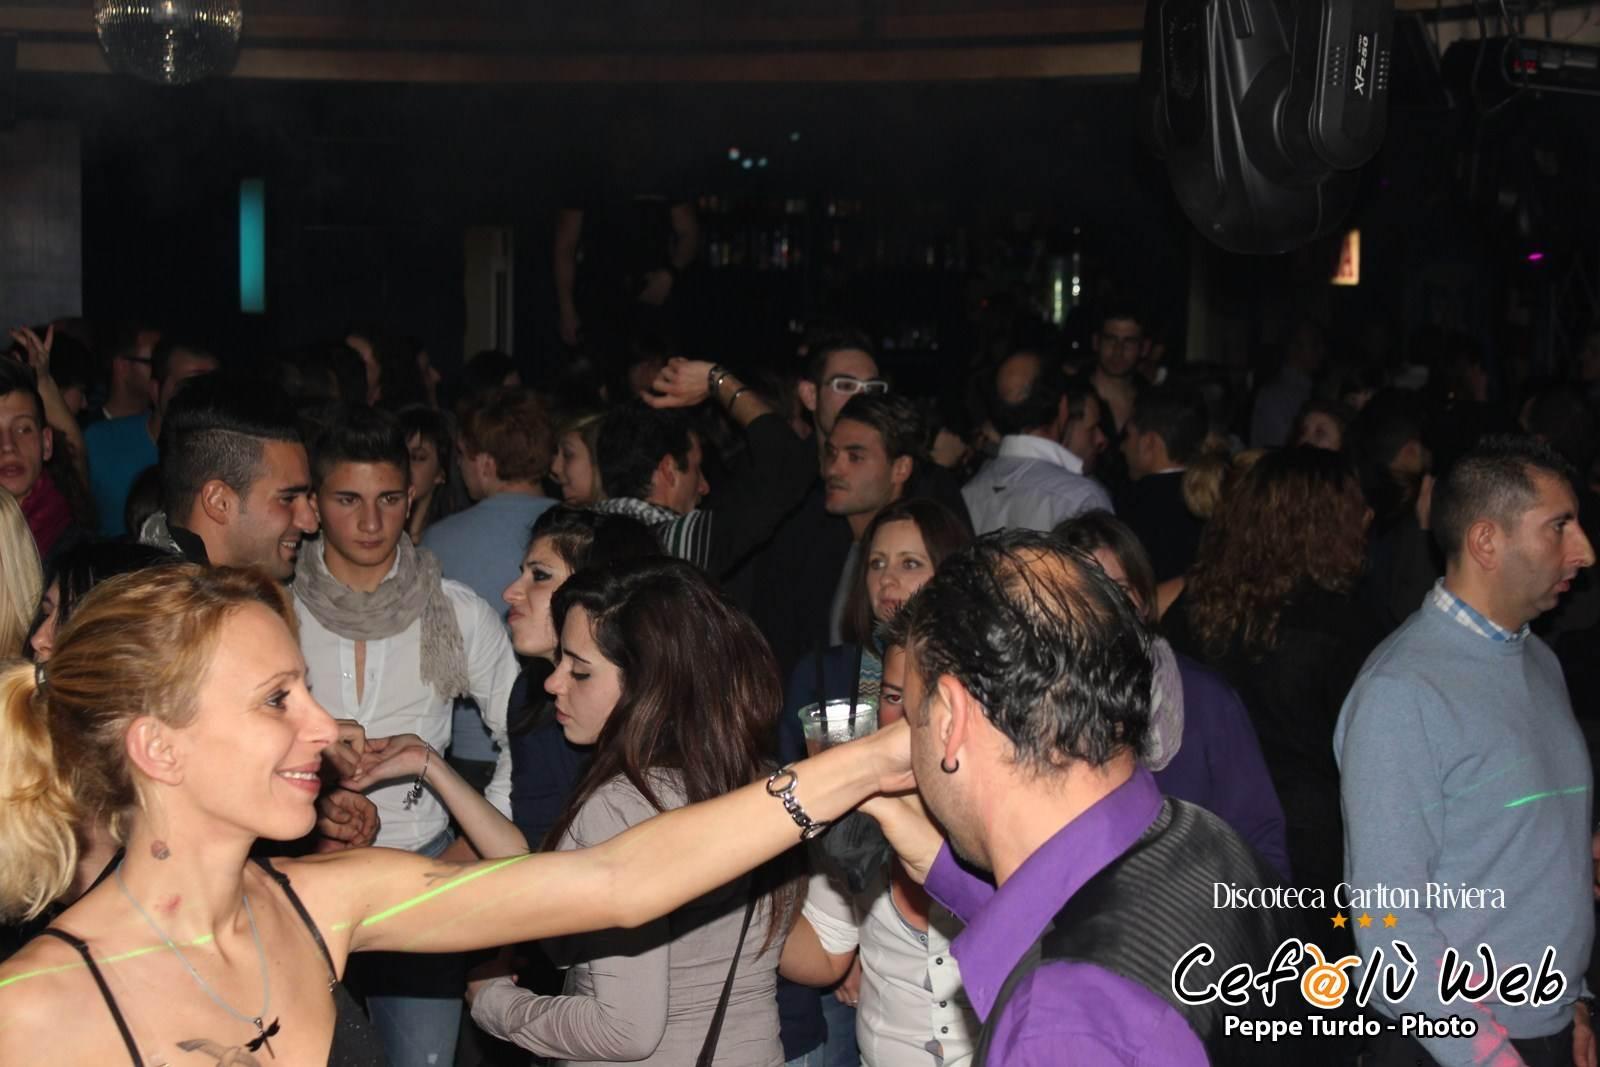 Discoteca Carlton Riviera: 5 Gennaio 2013